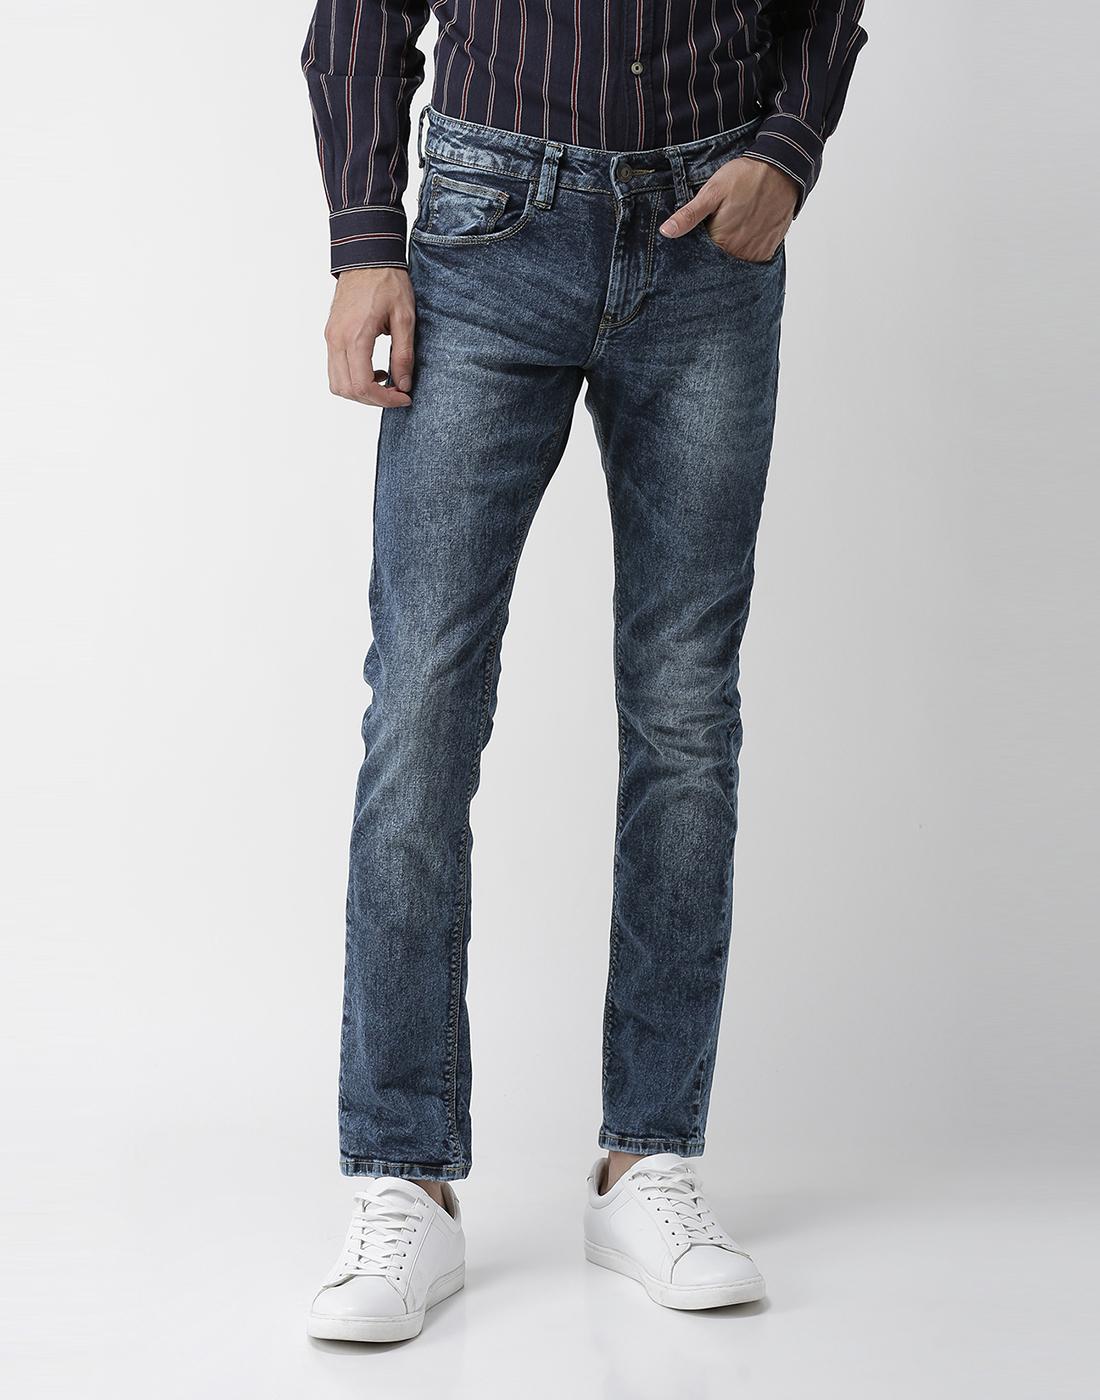 celio | Cotton Blend Slim Fit Dark Blue Jeans